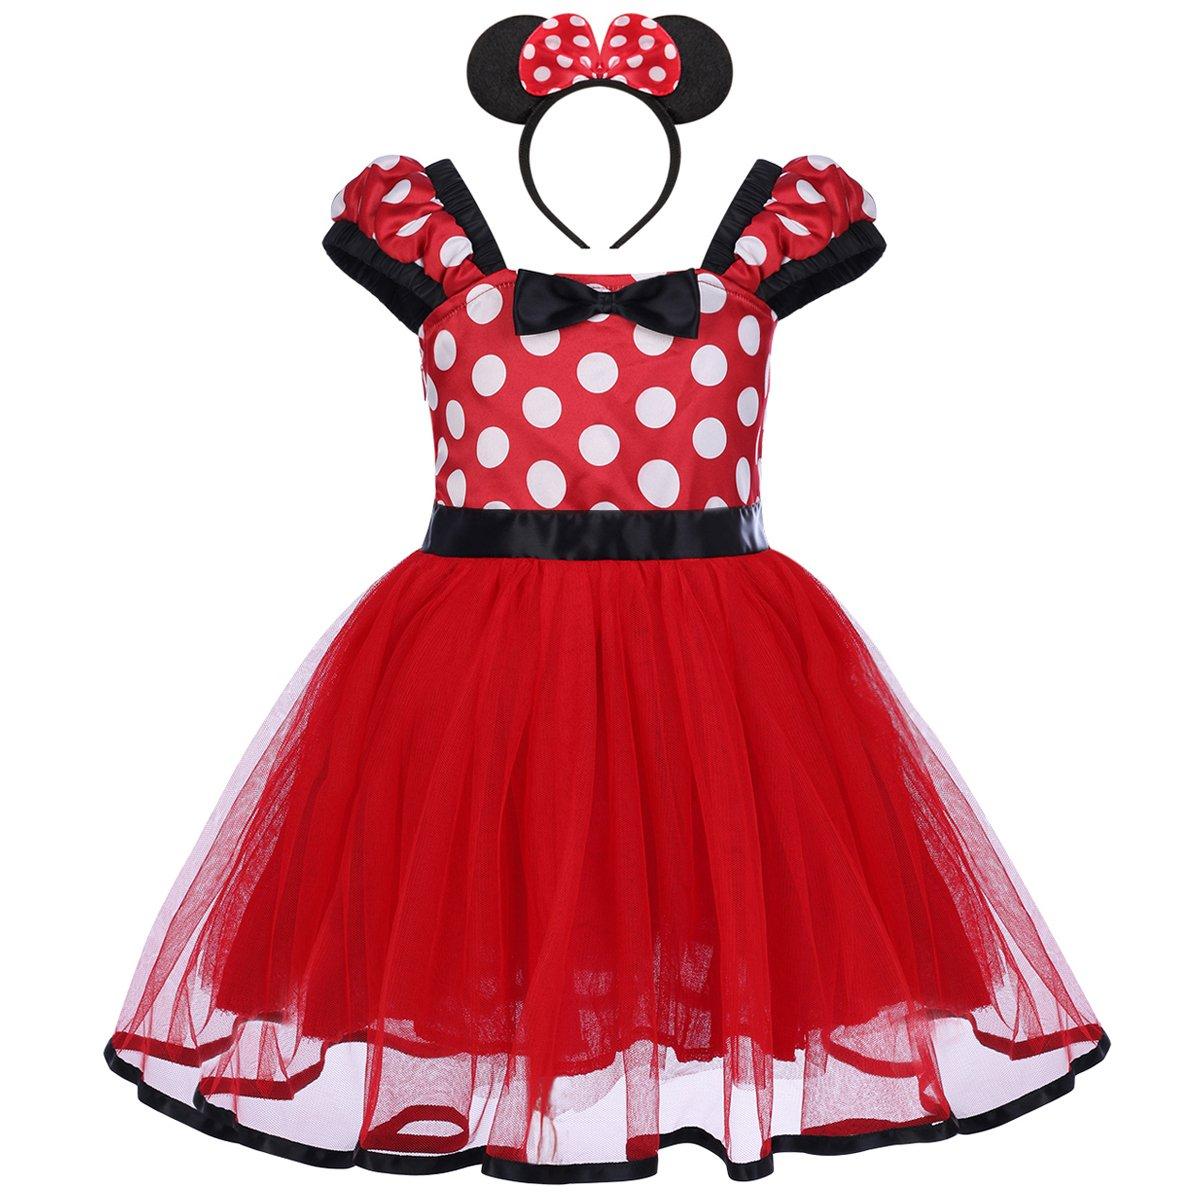 Baby Kid Girl Minnie Polka Dot Tutu Fancy Dress Headband Cartoon Bowknot Party Cosplay Dance Costume, Red, 4-5 Years